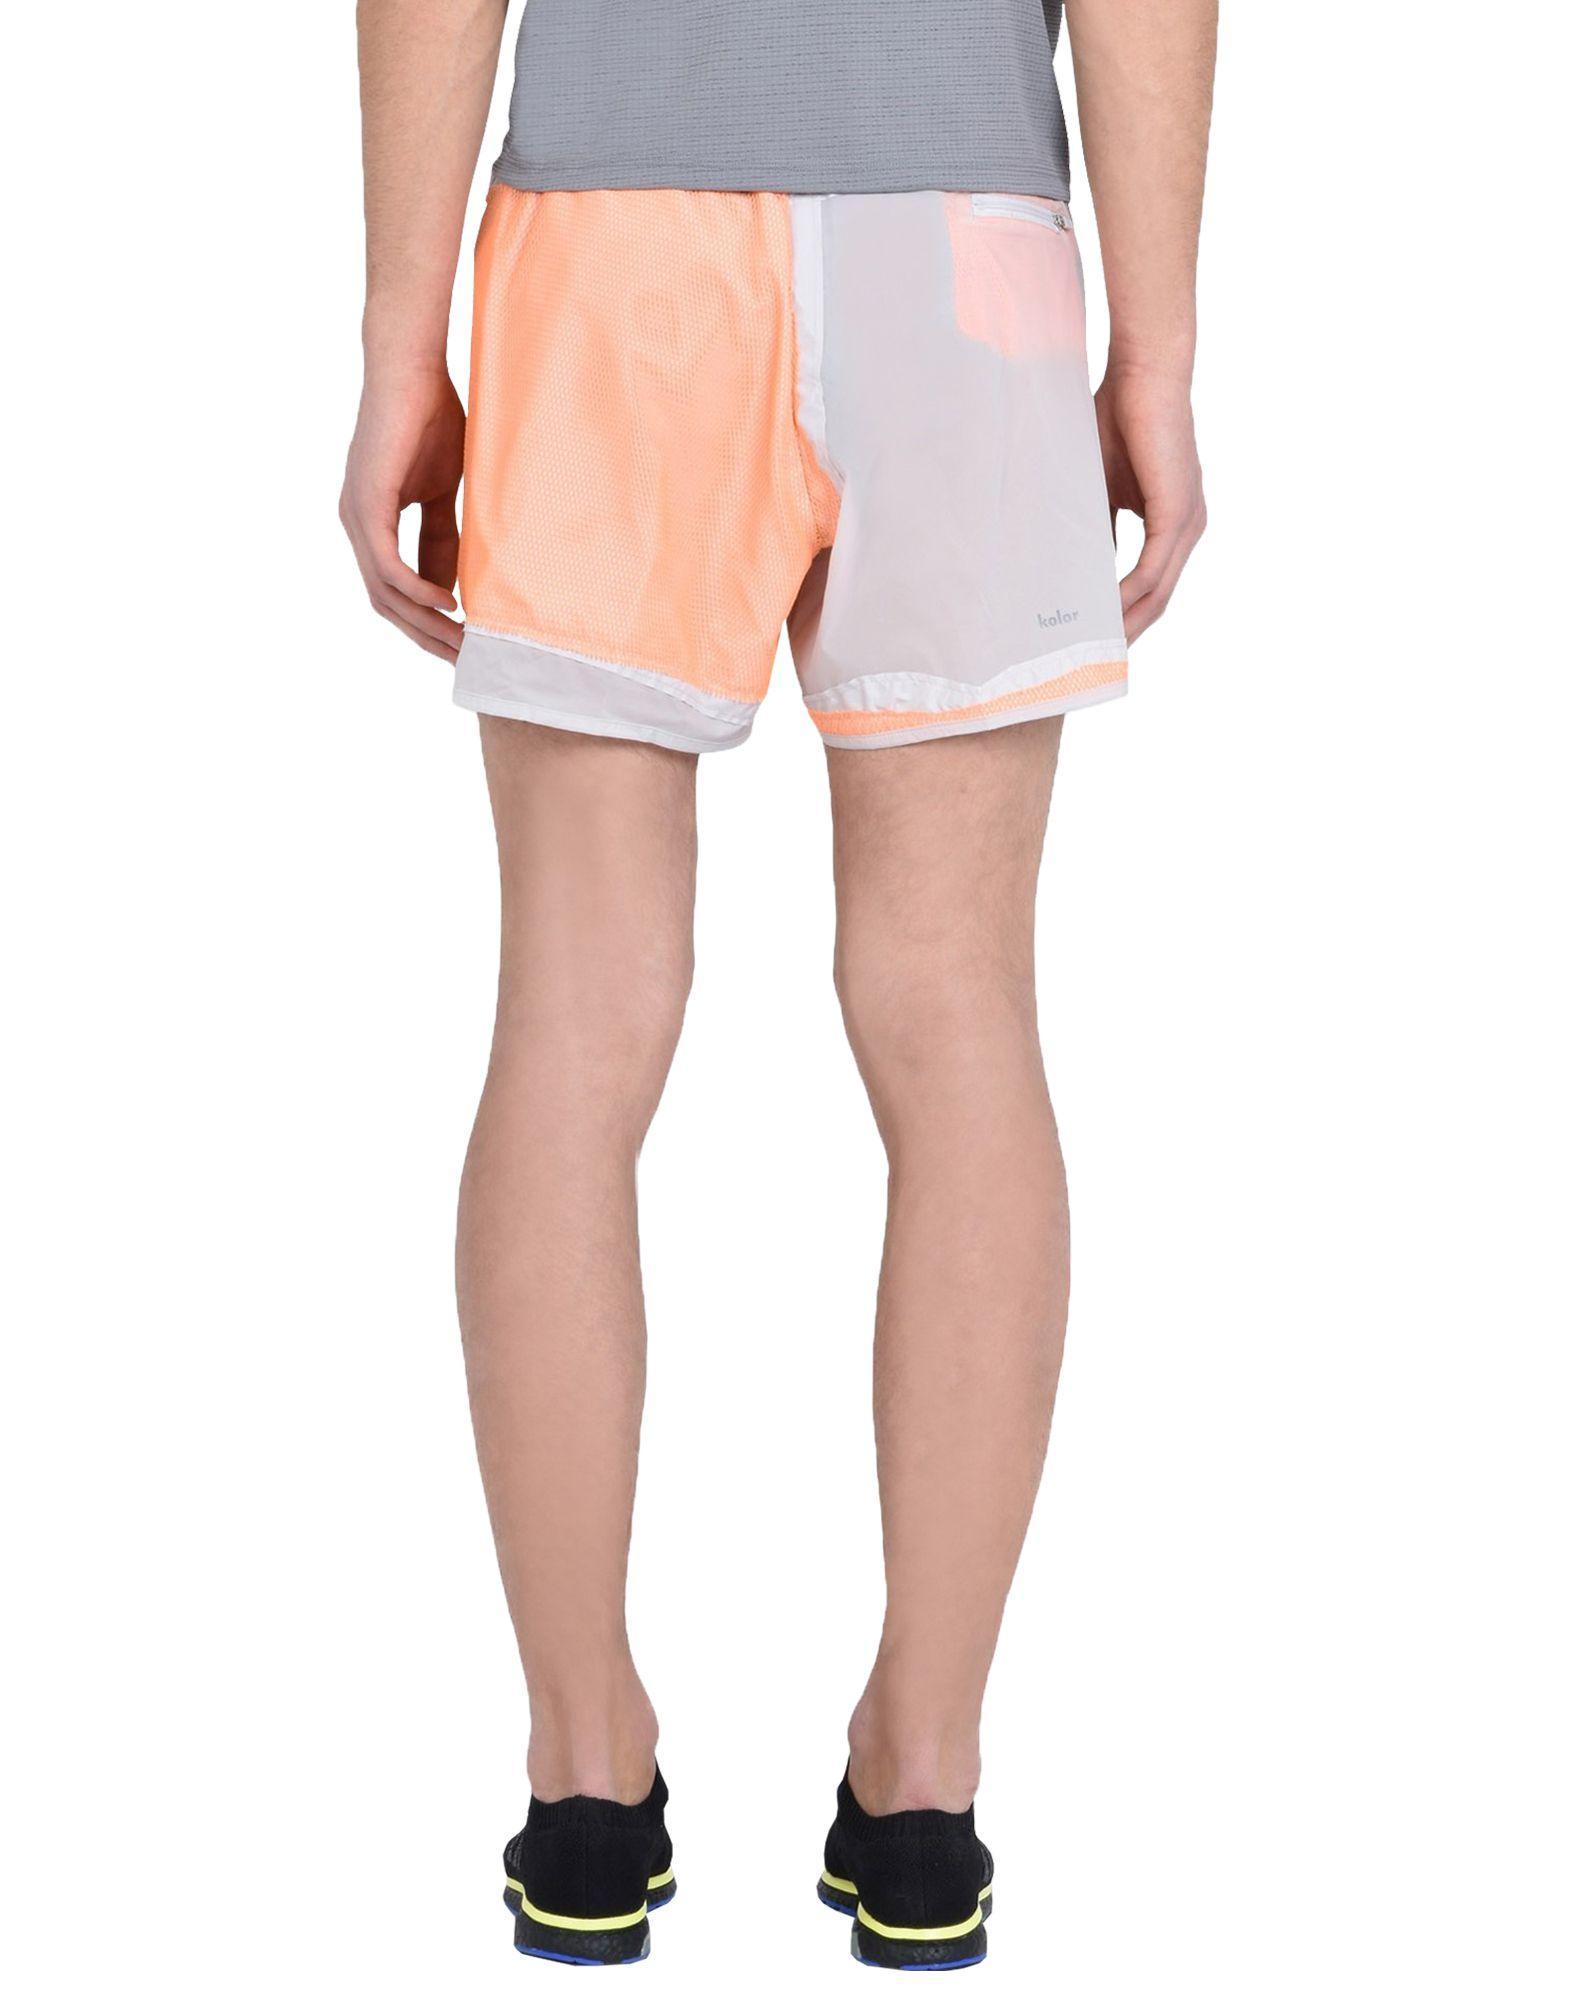 f8ec69507e Lyst - adidas Originals Shorts in Gray for Men - Save 17%